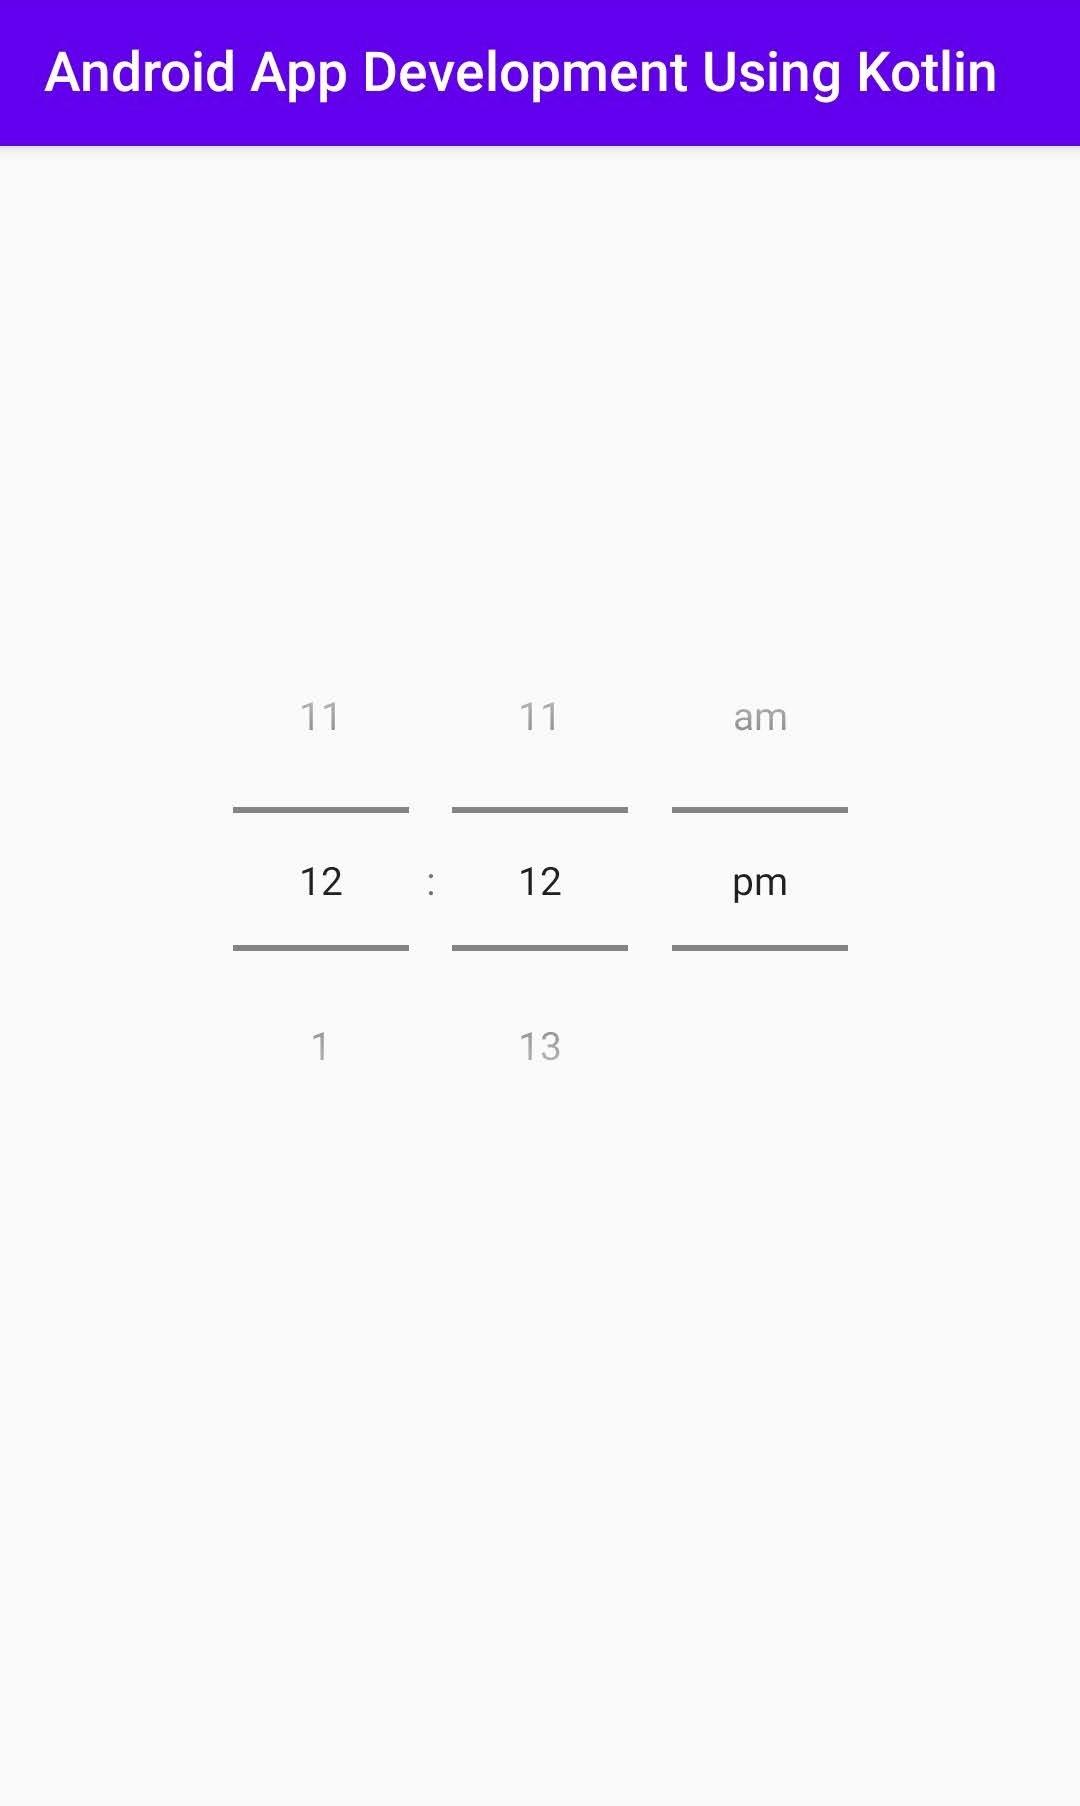 timepicker android kotlin example Android using Kotlin.